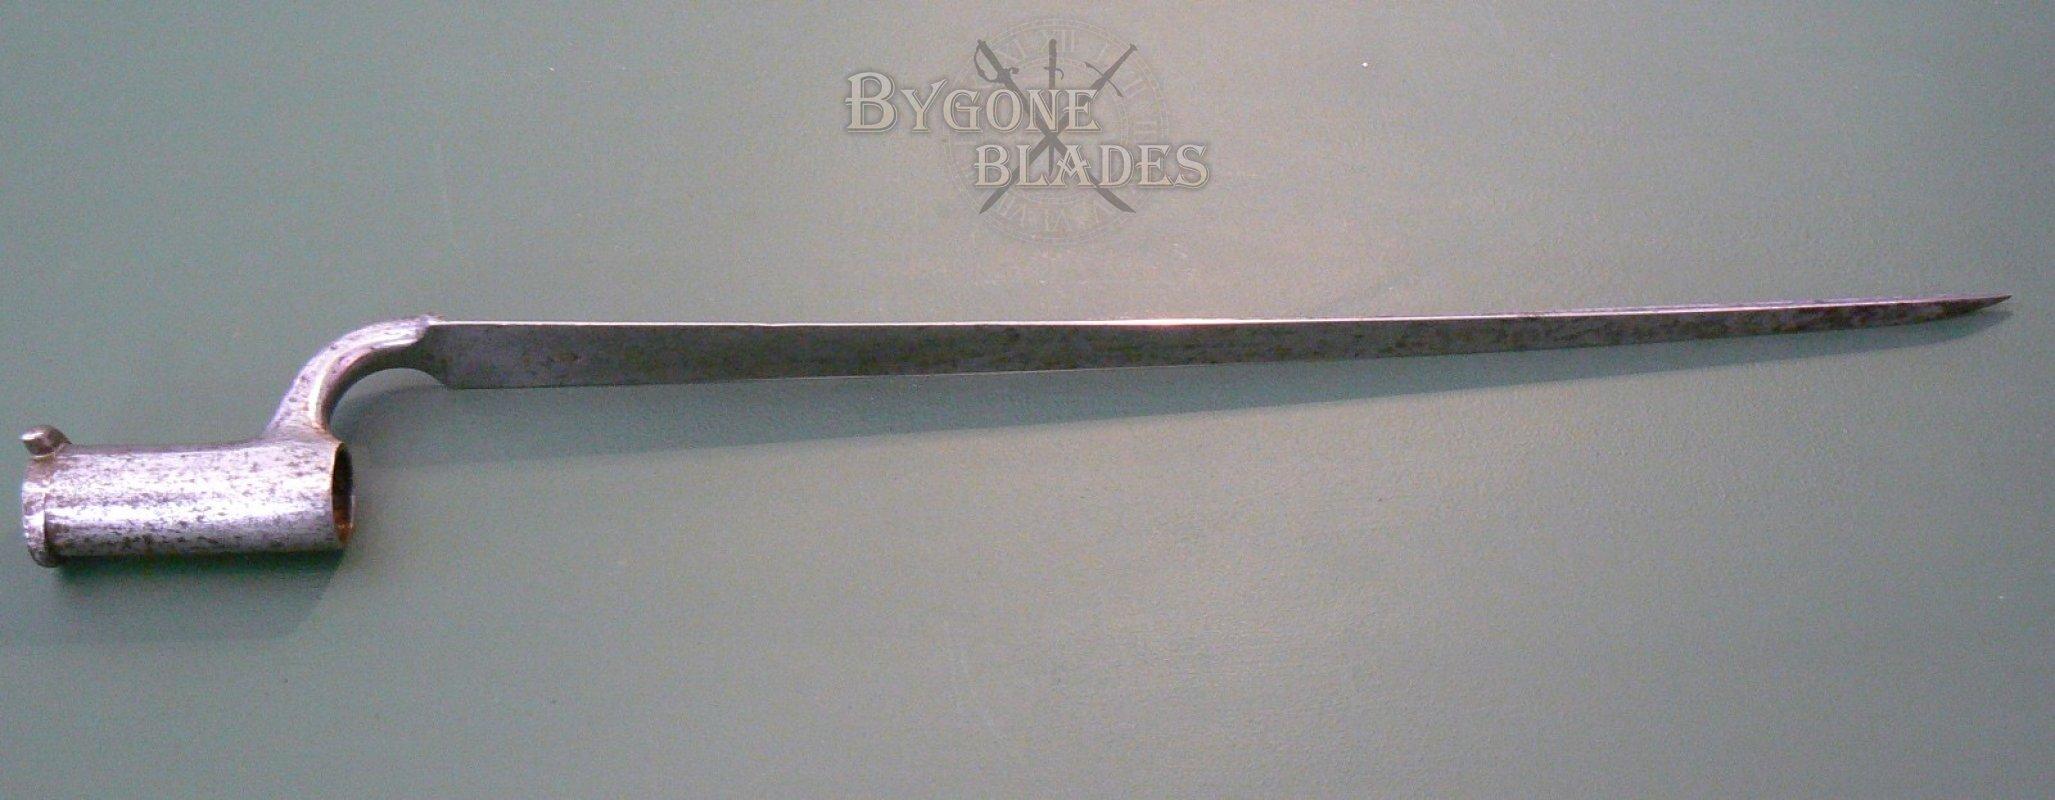 British P1842 Lovell Catch Socket Bayonet Bygone Blades